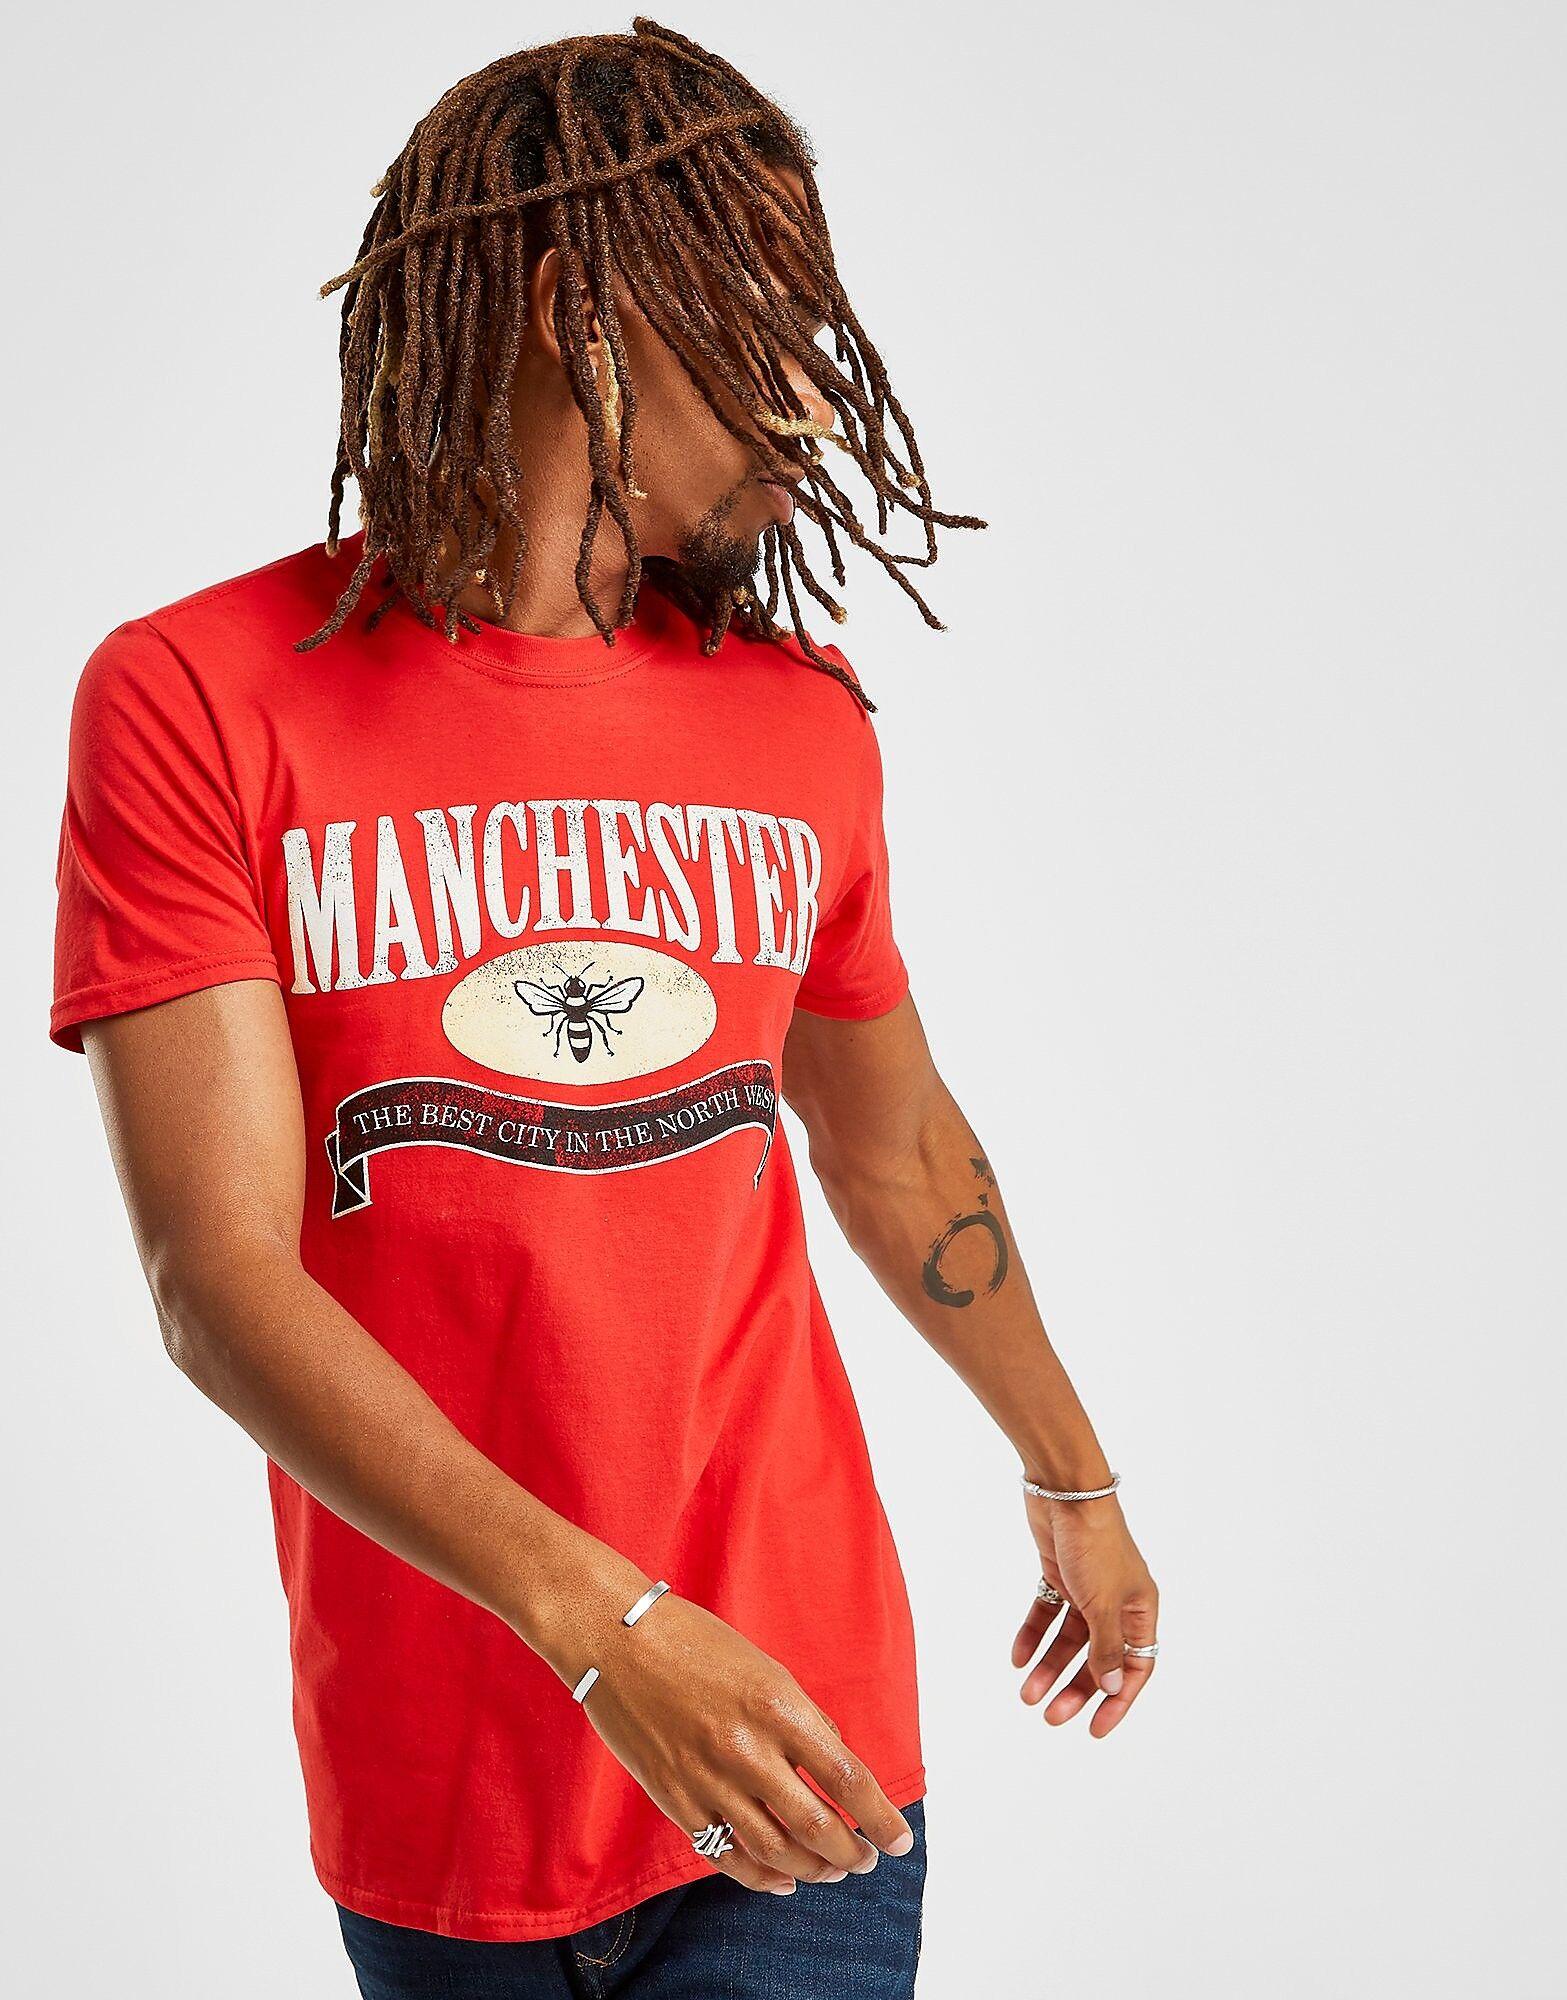 Official Team Manchester North West T-paita Miehet - Mens, Punainen